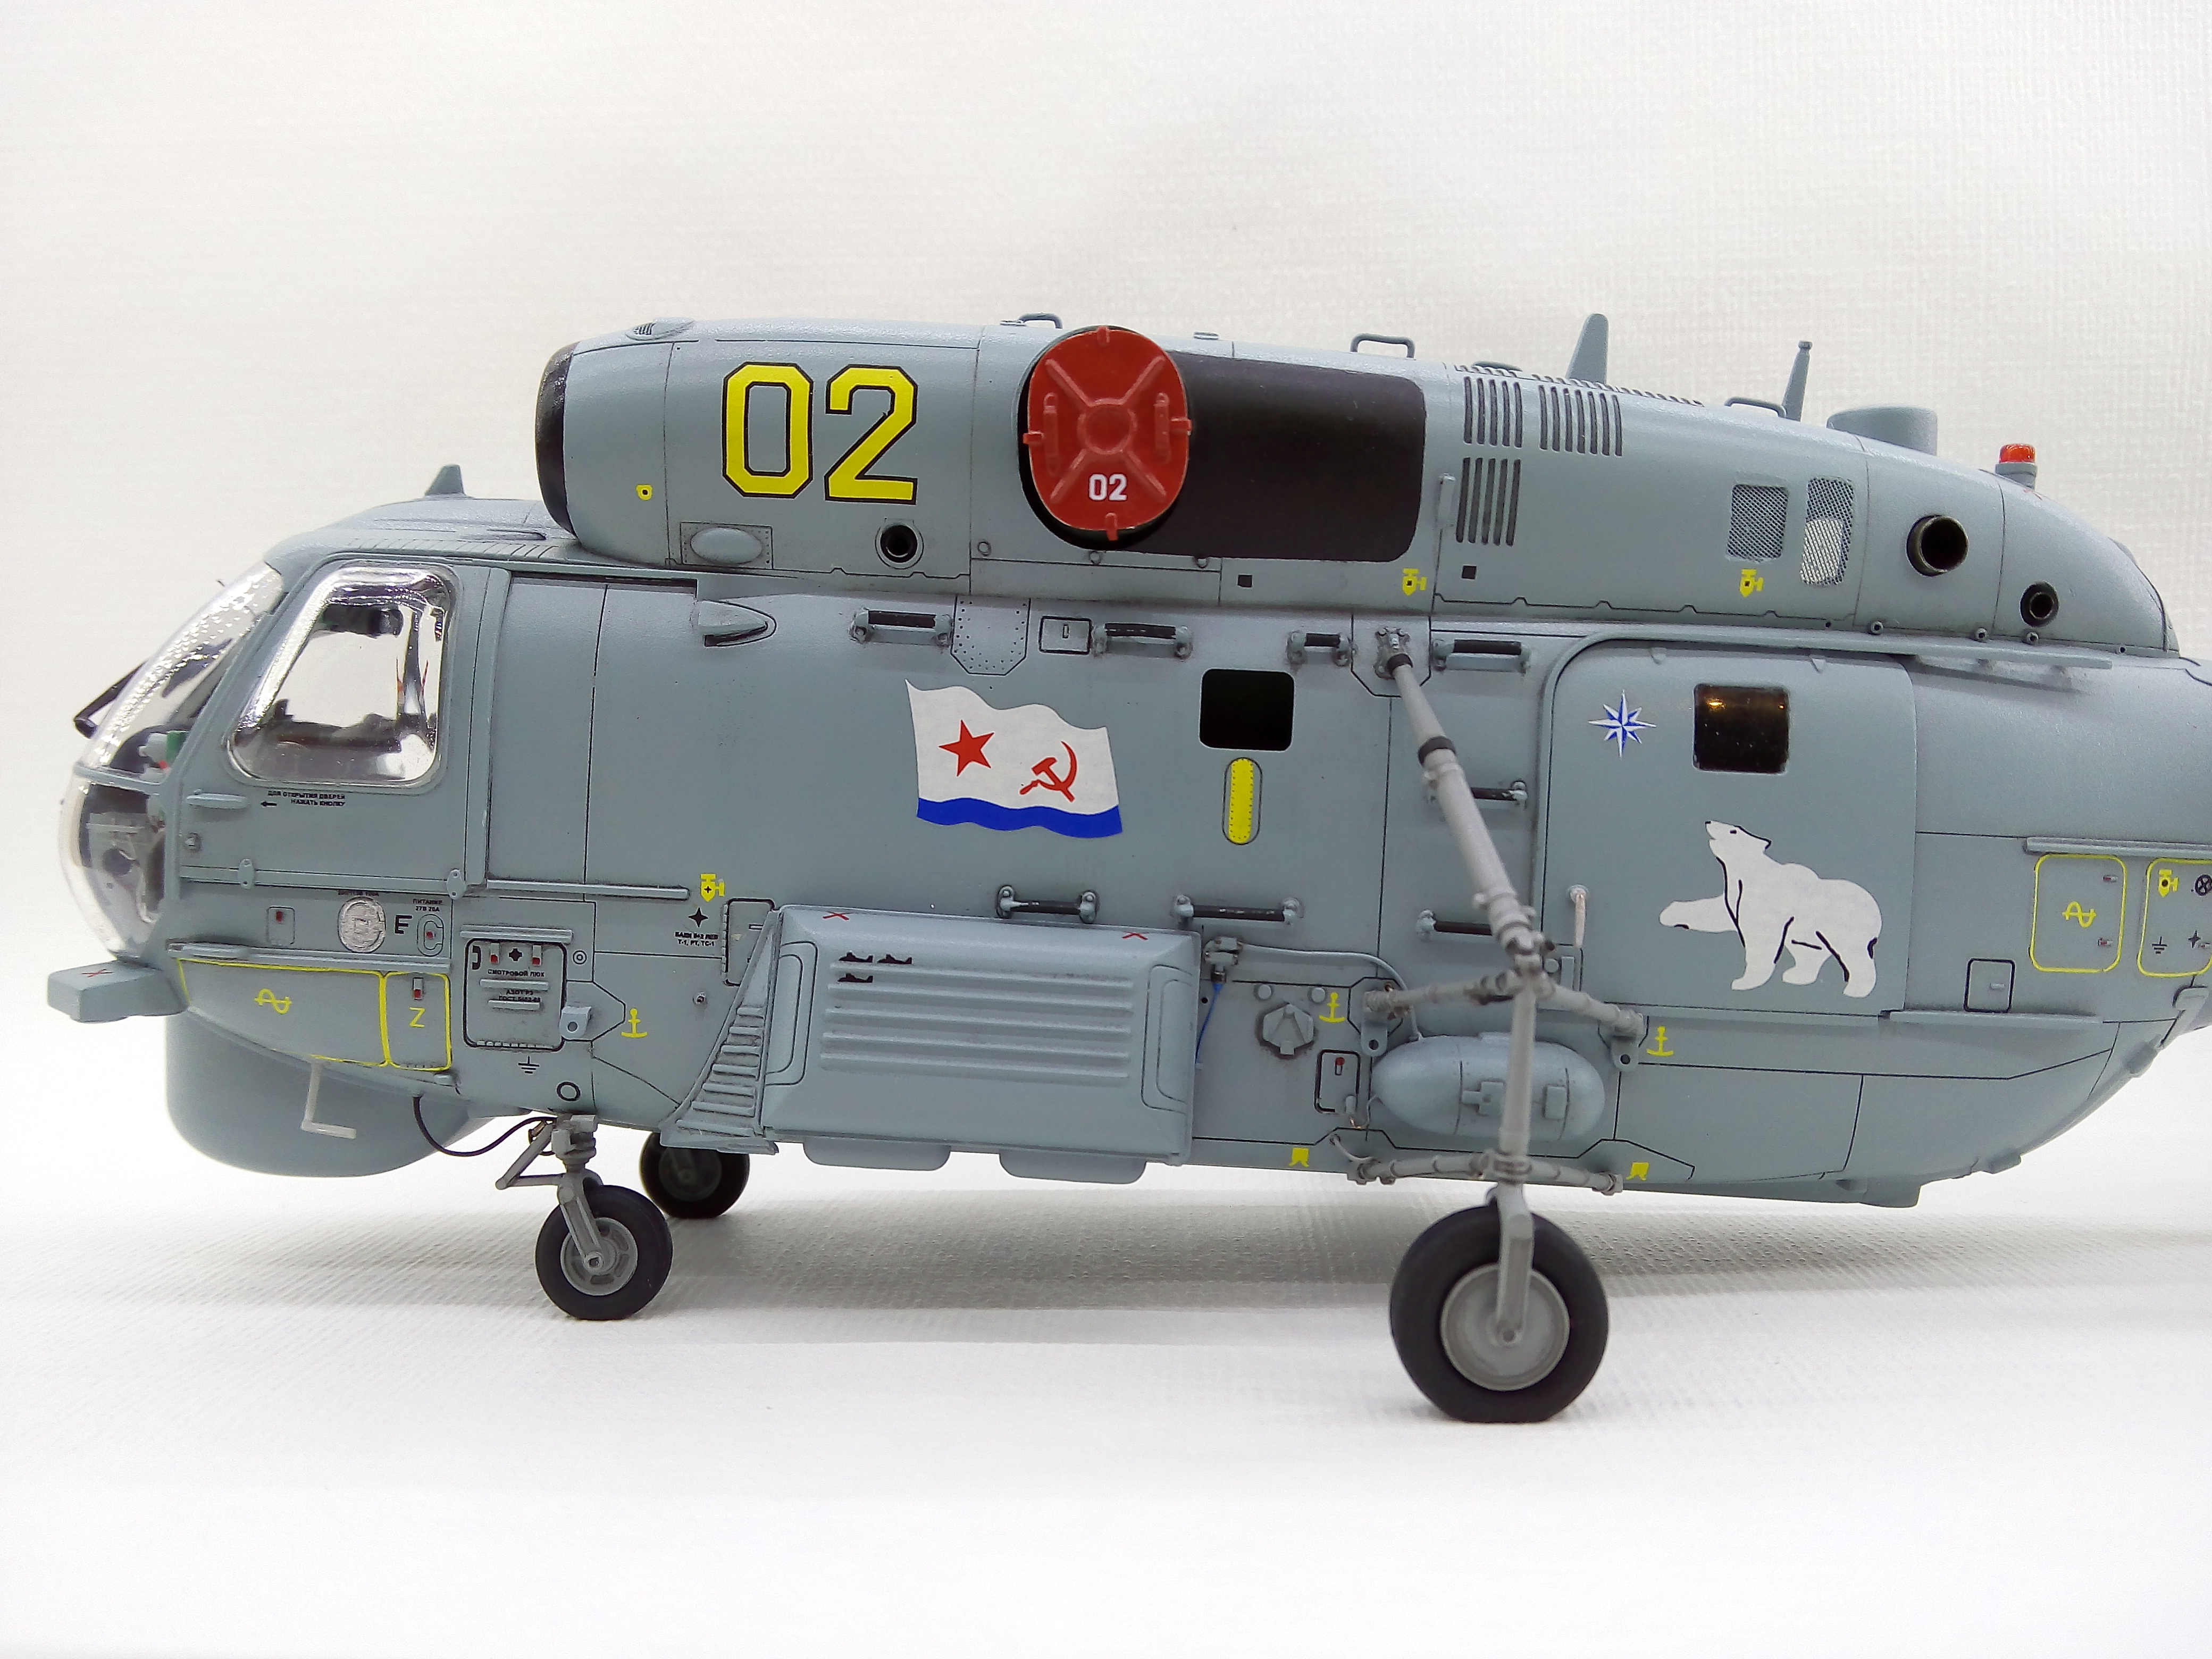 Ка-27ПЛ 1/48 HOBBYBOSS - Страница 4 B160f5e43bbf